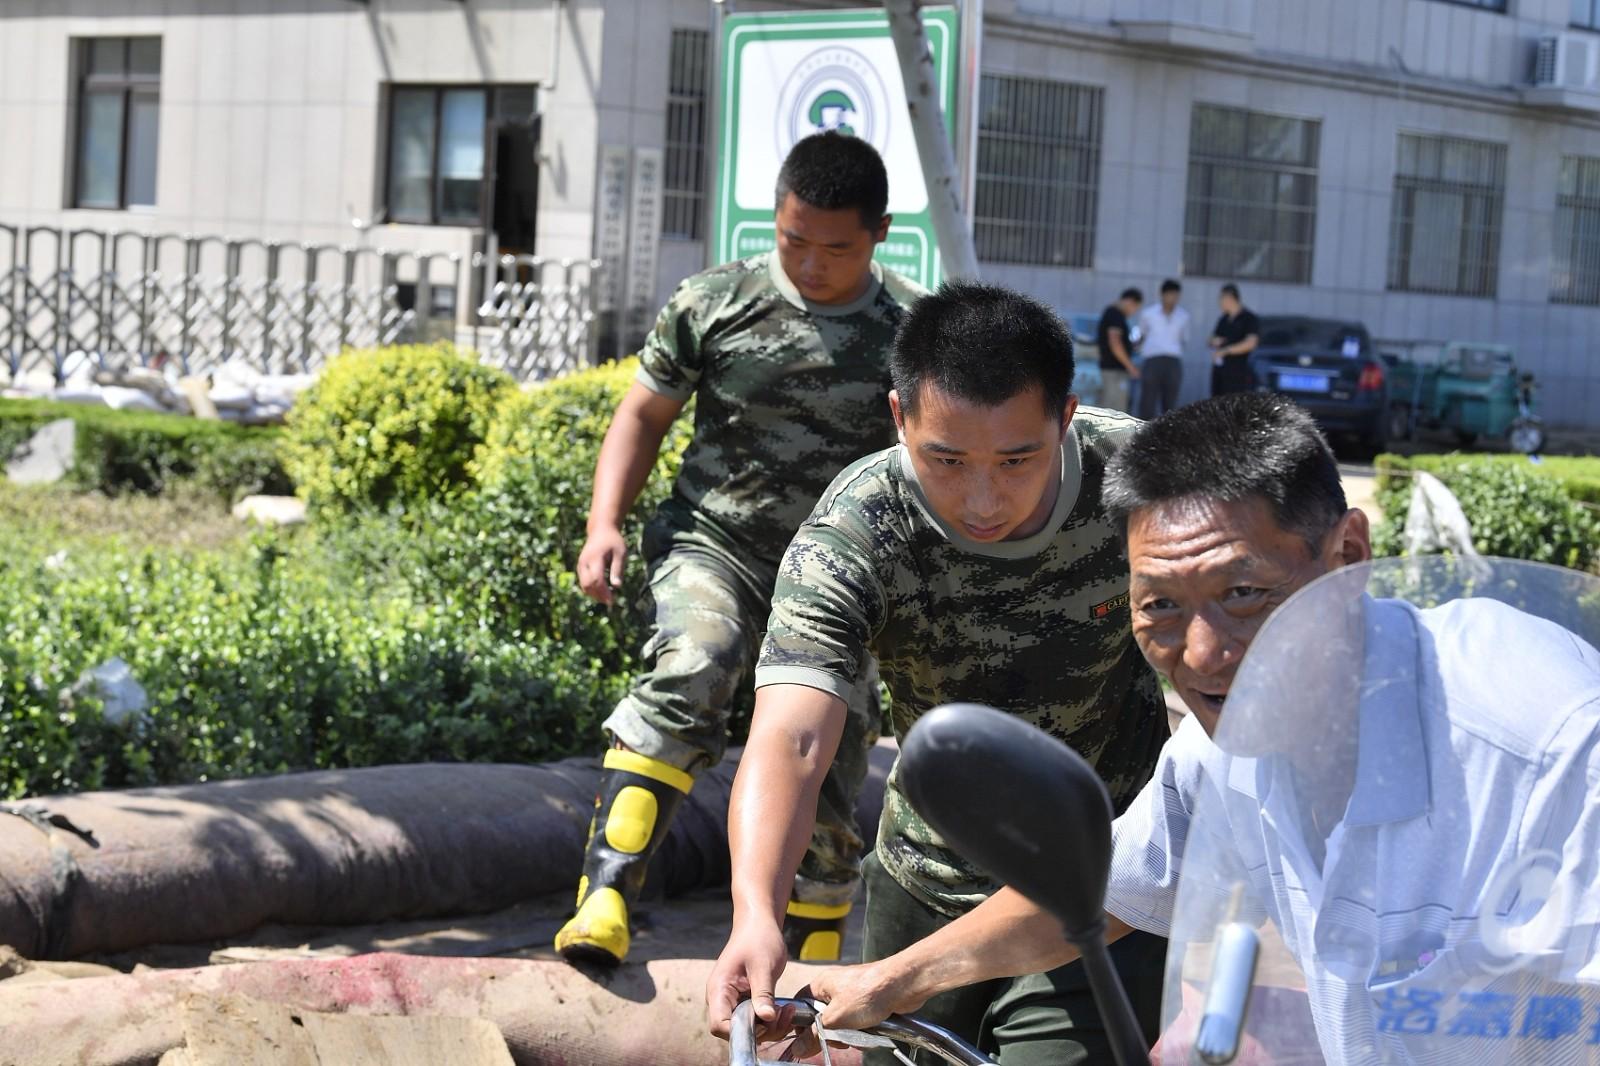 Relief efforts in China's vegetable capital underway